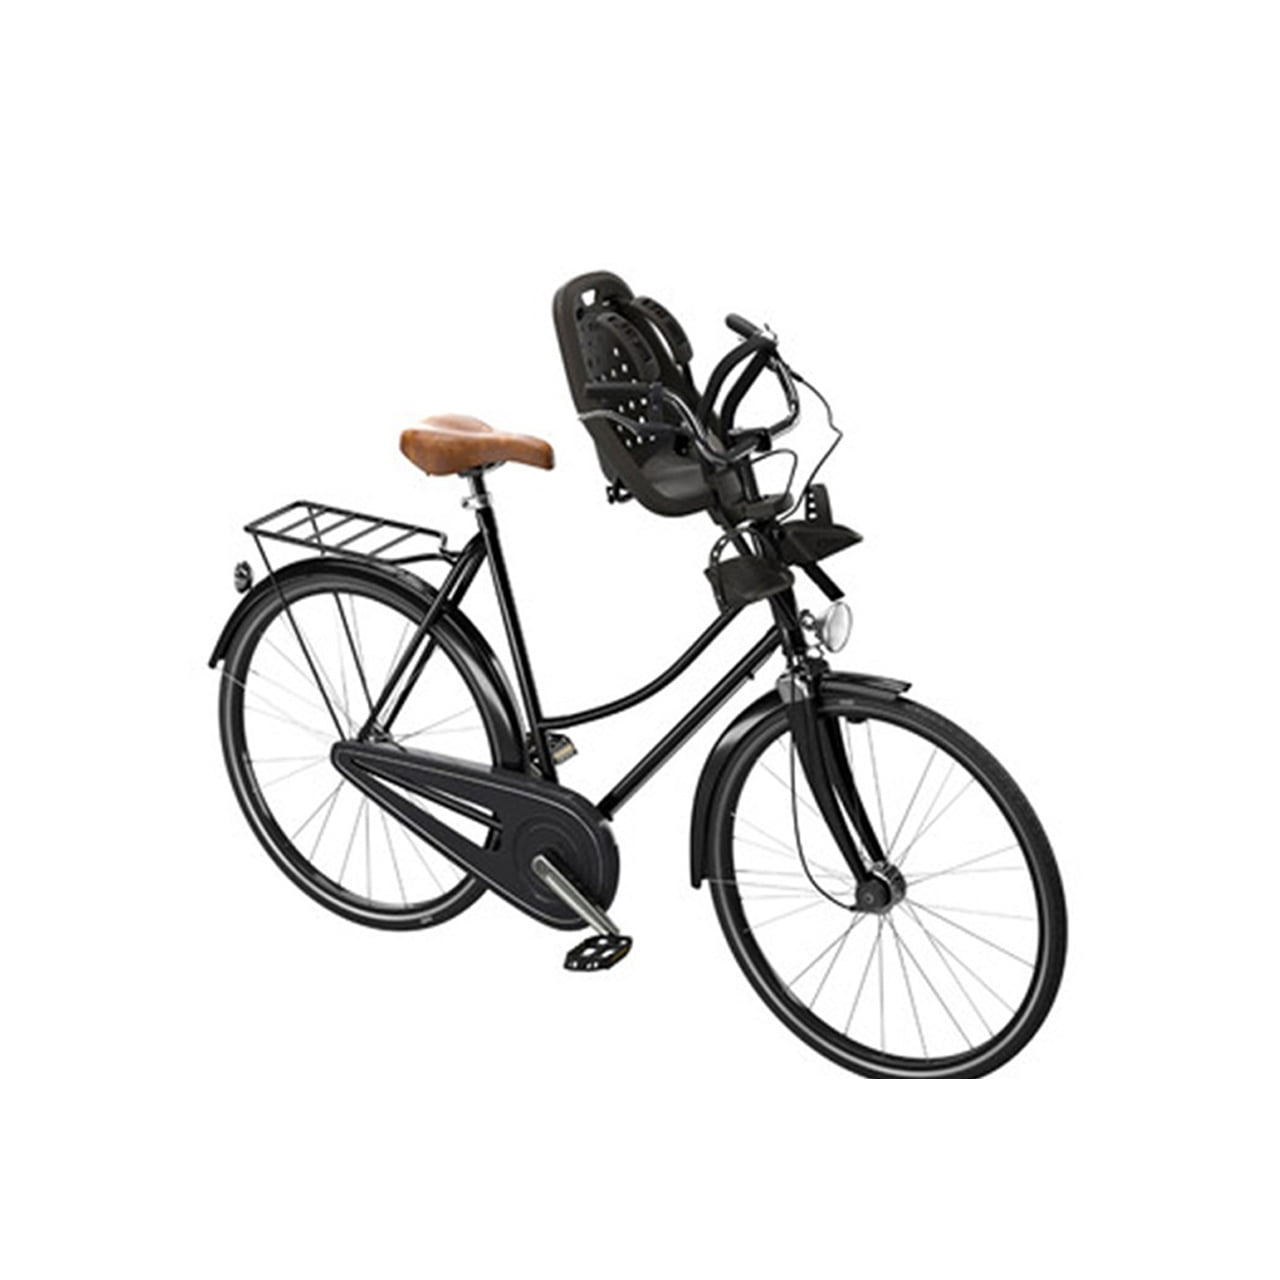 Scaun pentru copii cu montare pe bicicleta in fata Thule Yepp Mini Black 4